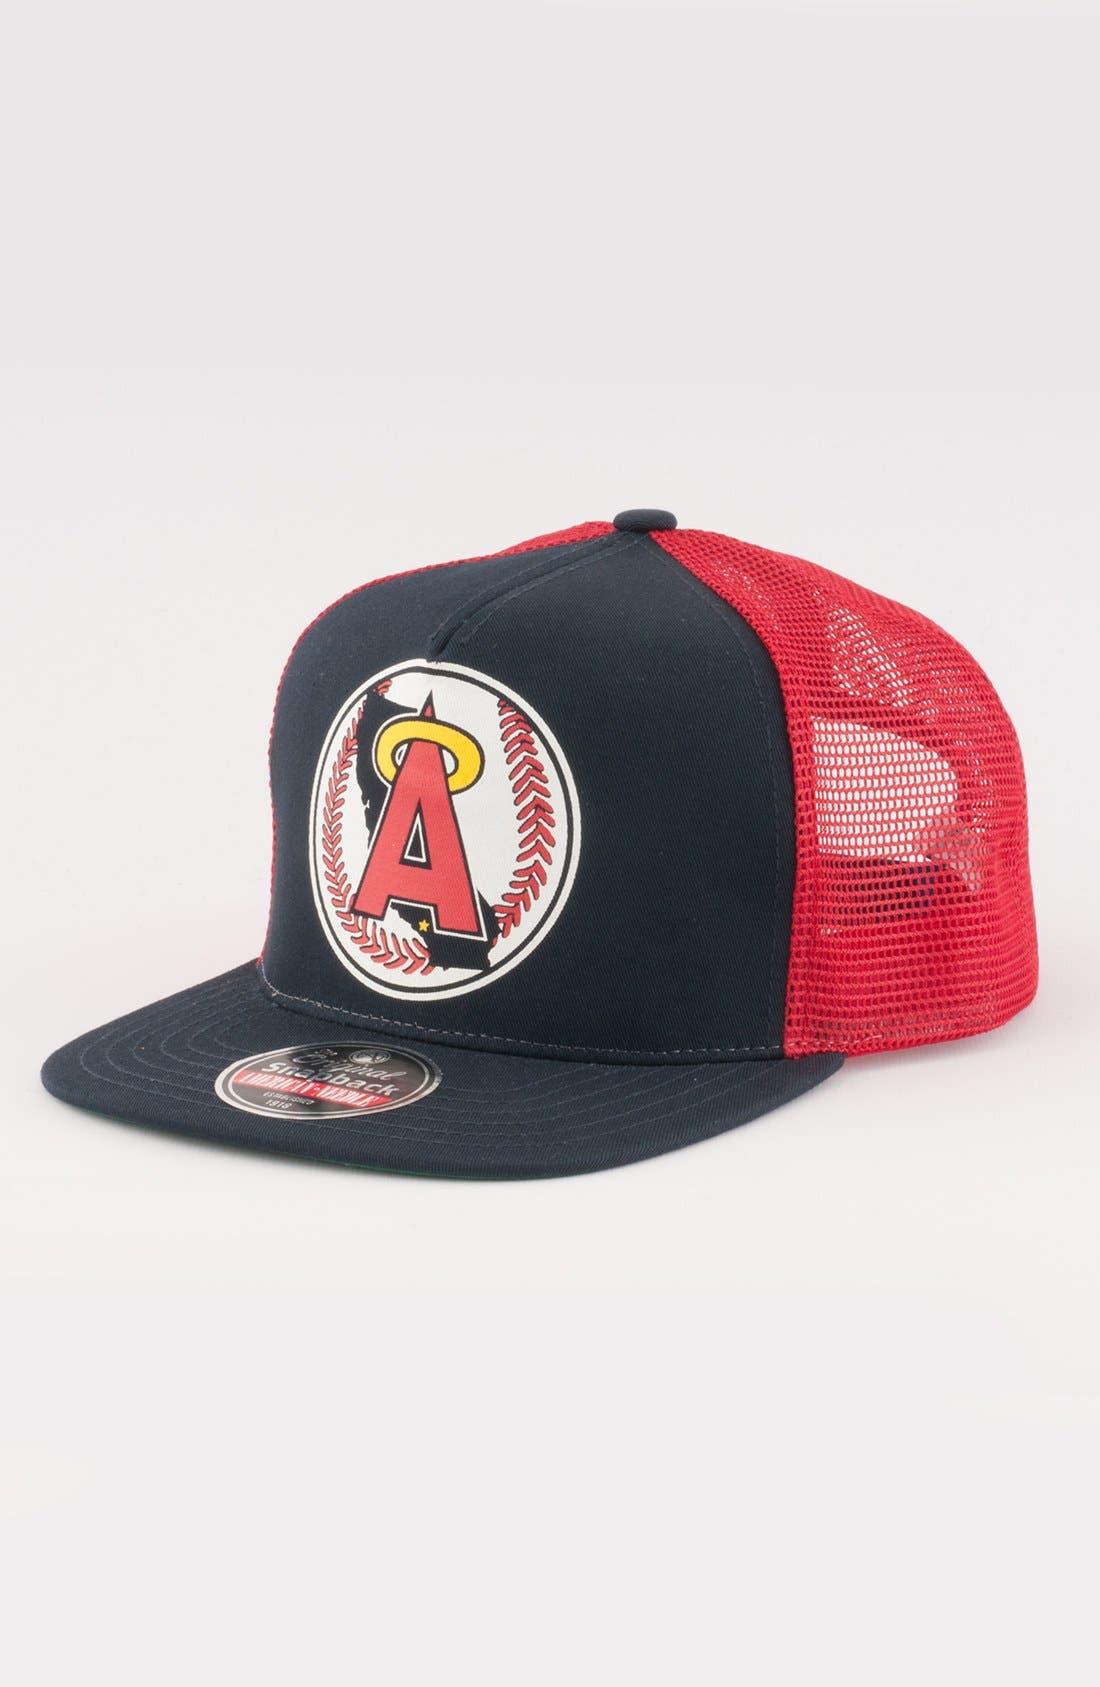 Main Image - American Needle 'Los Angeles Angels of Anaheim - Gatekeeper' Baseball Cap